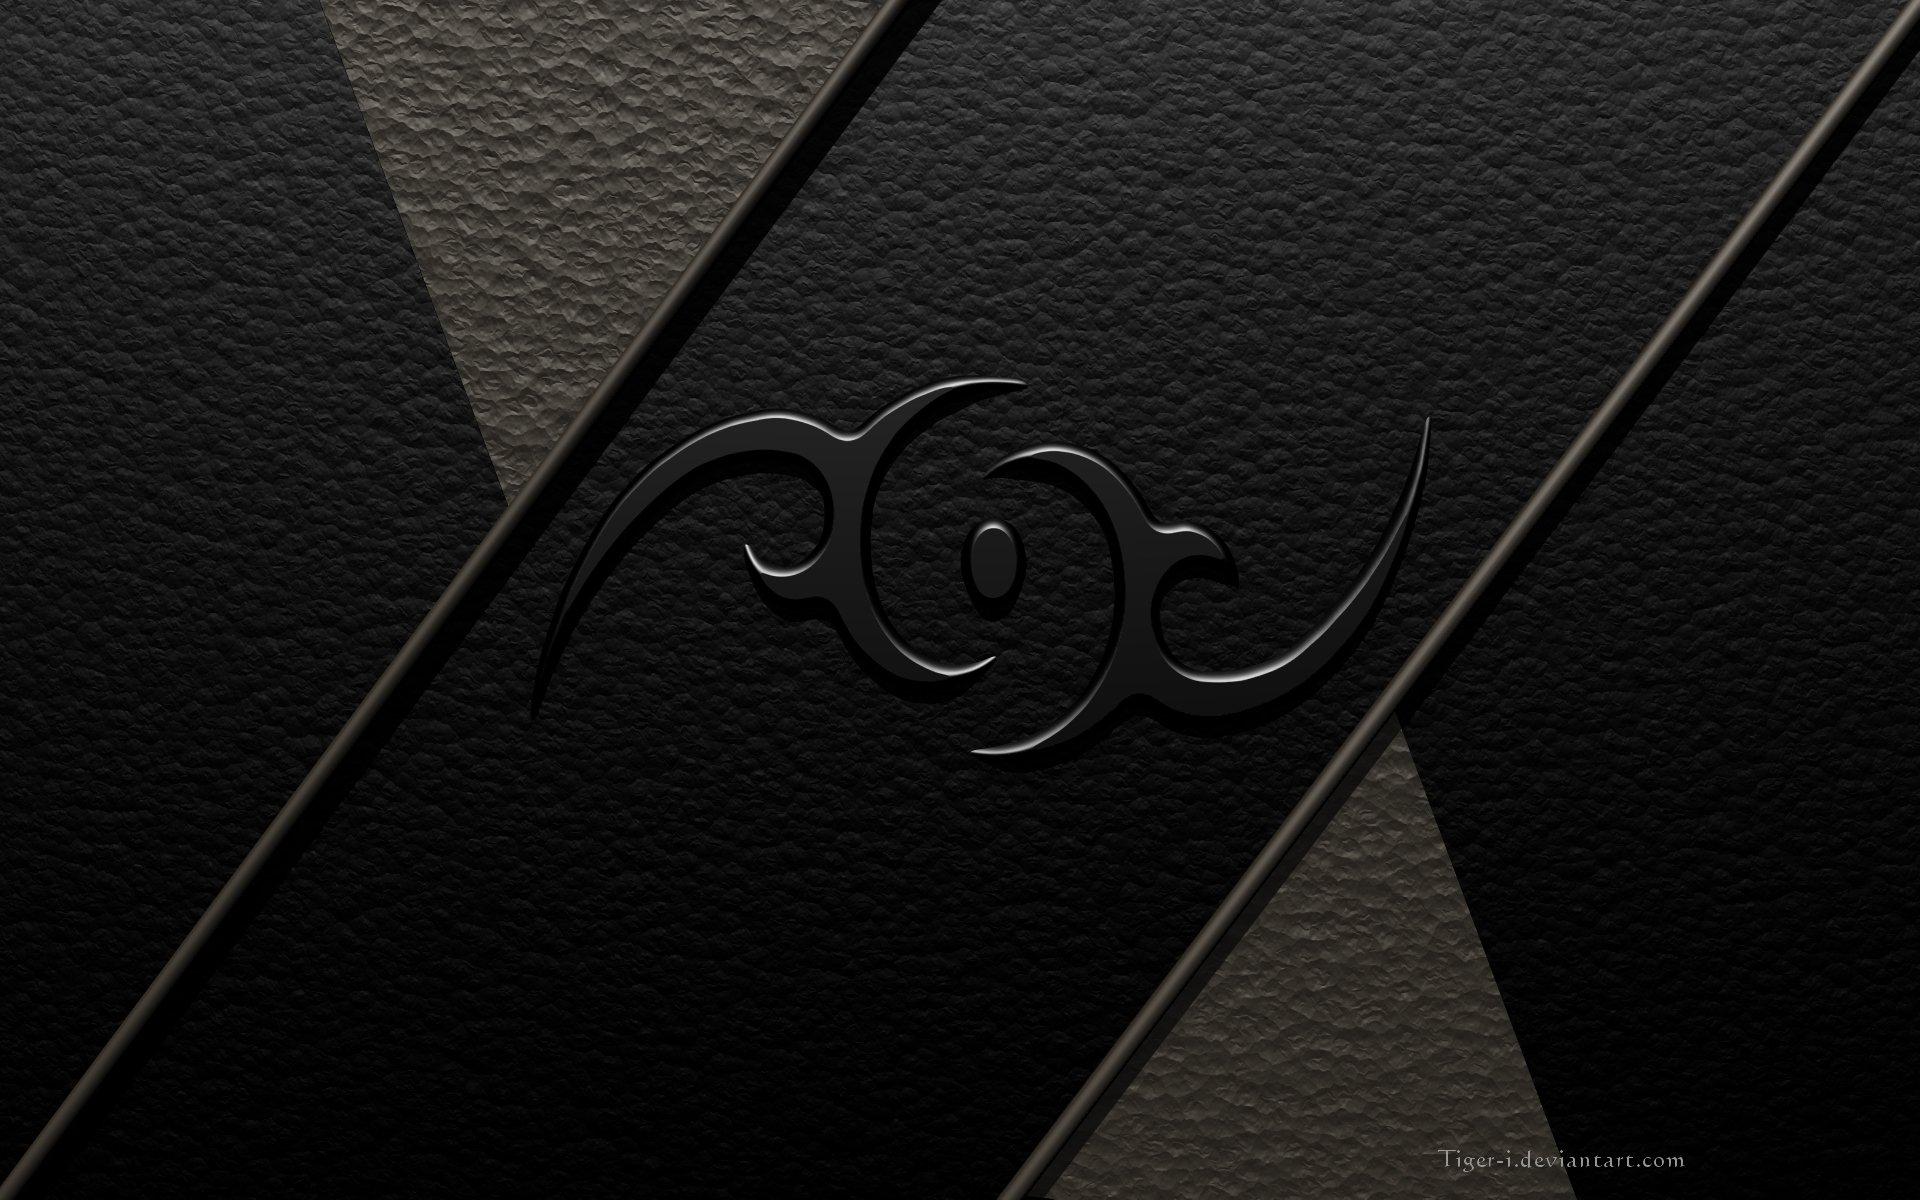 Hd Tribal Wallpapers: Tribal Design Wallpaper-black Full HD Wallpaper And